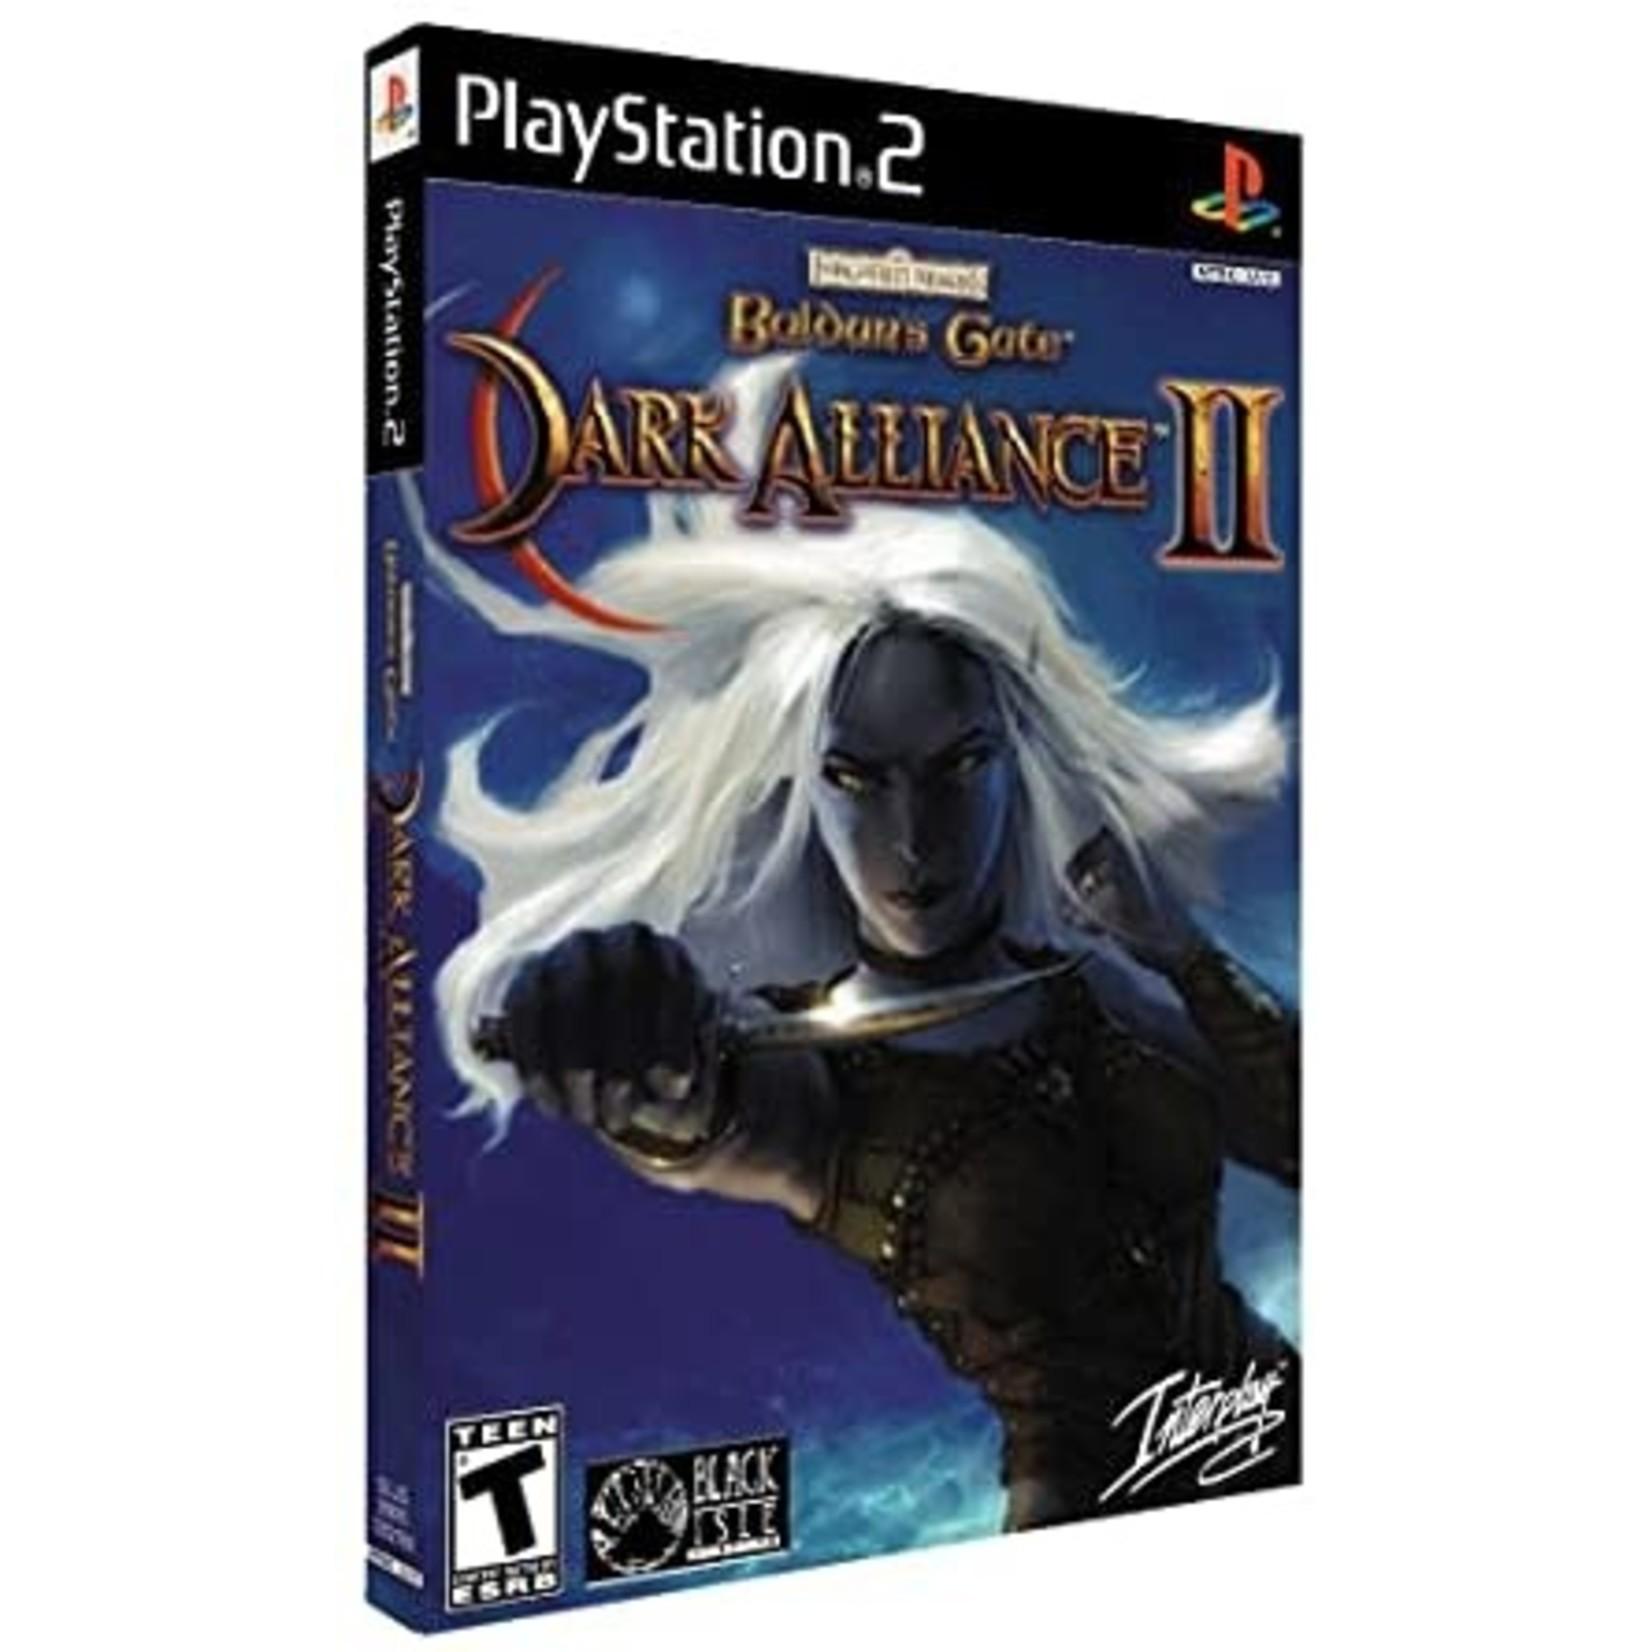 PS2U-Baldur's Gate Dark Alliance II